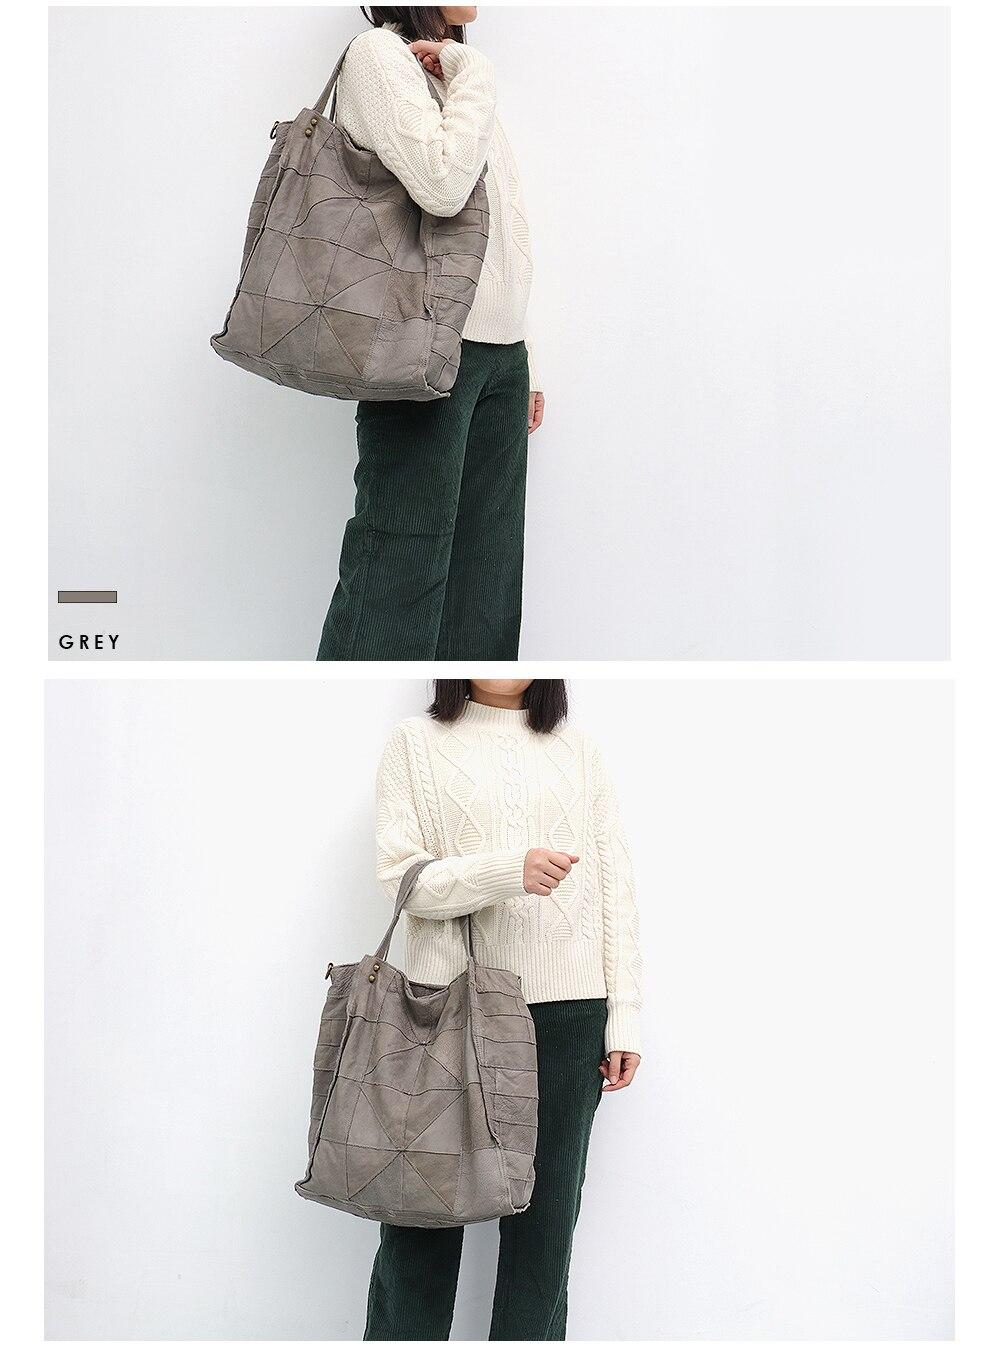 Sc splice vintage couro das mulheres bolsas